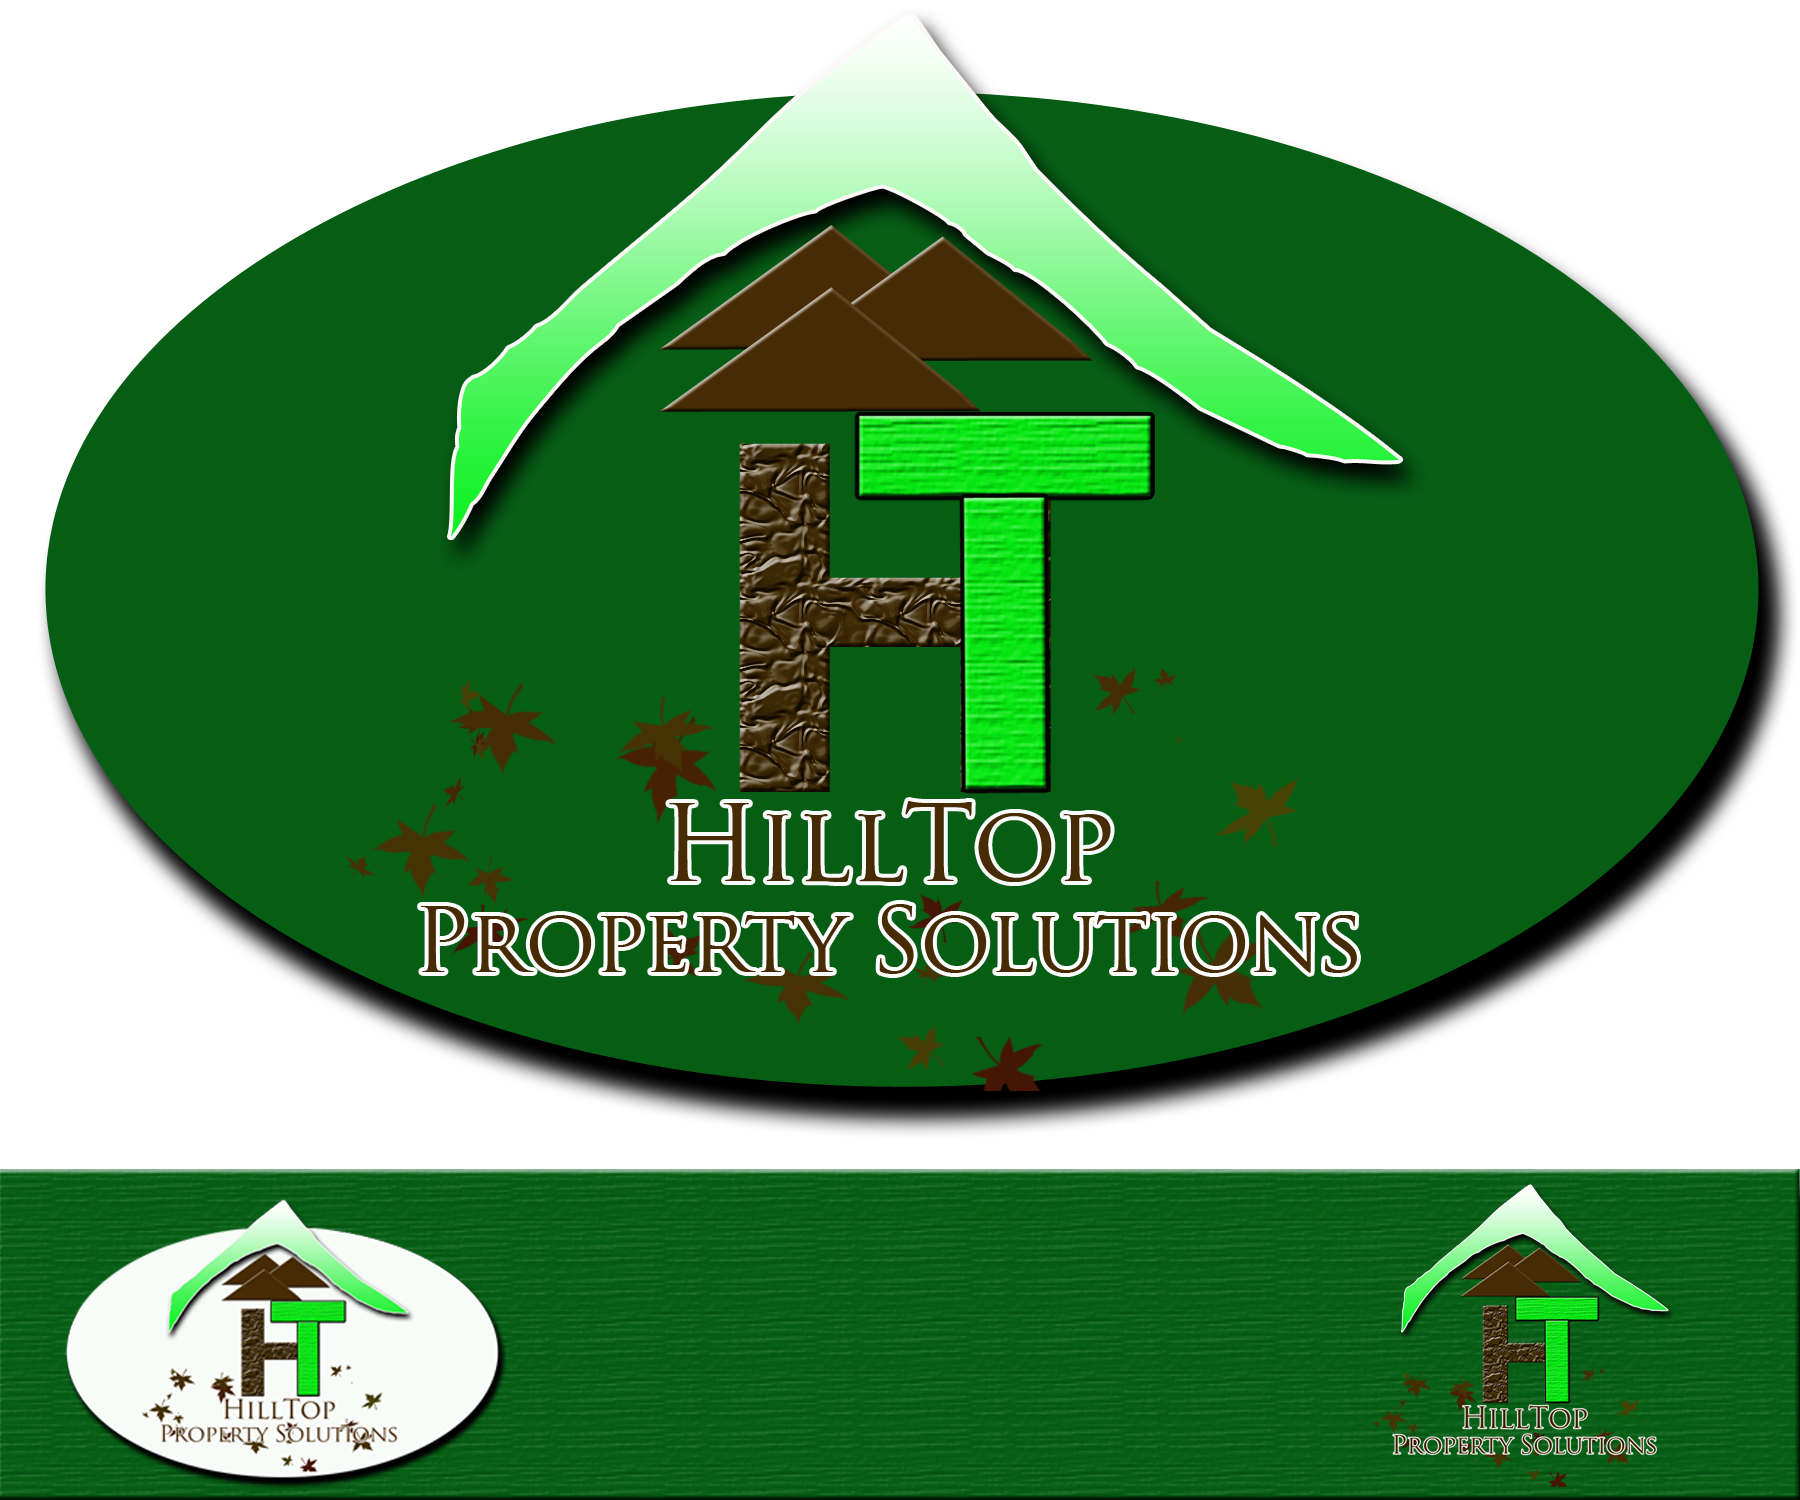 Logo Design by Jade Vinas - Entry No. 43 in the Logo Design Contest Imaginative Logo Design for Hilltop Property Solutions.